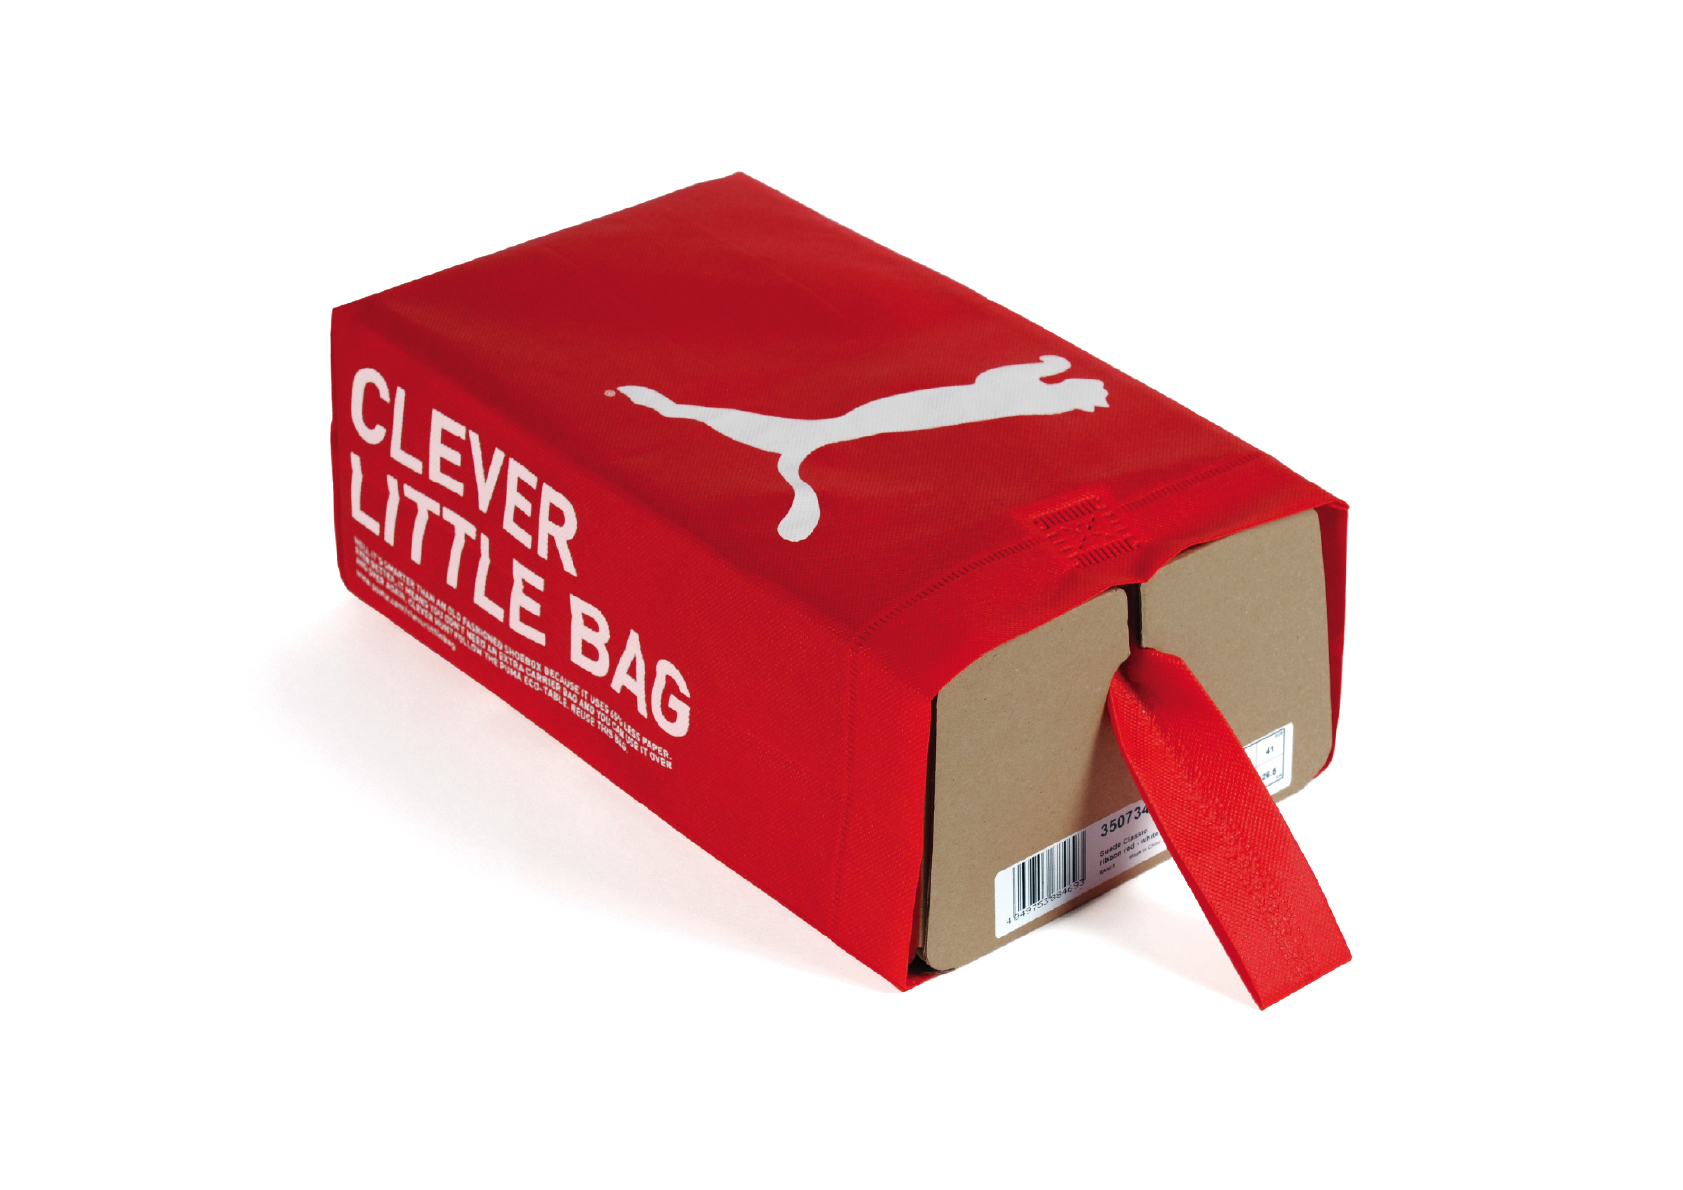 Clever Little Bag